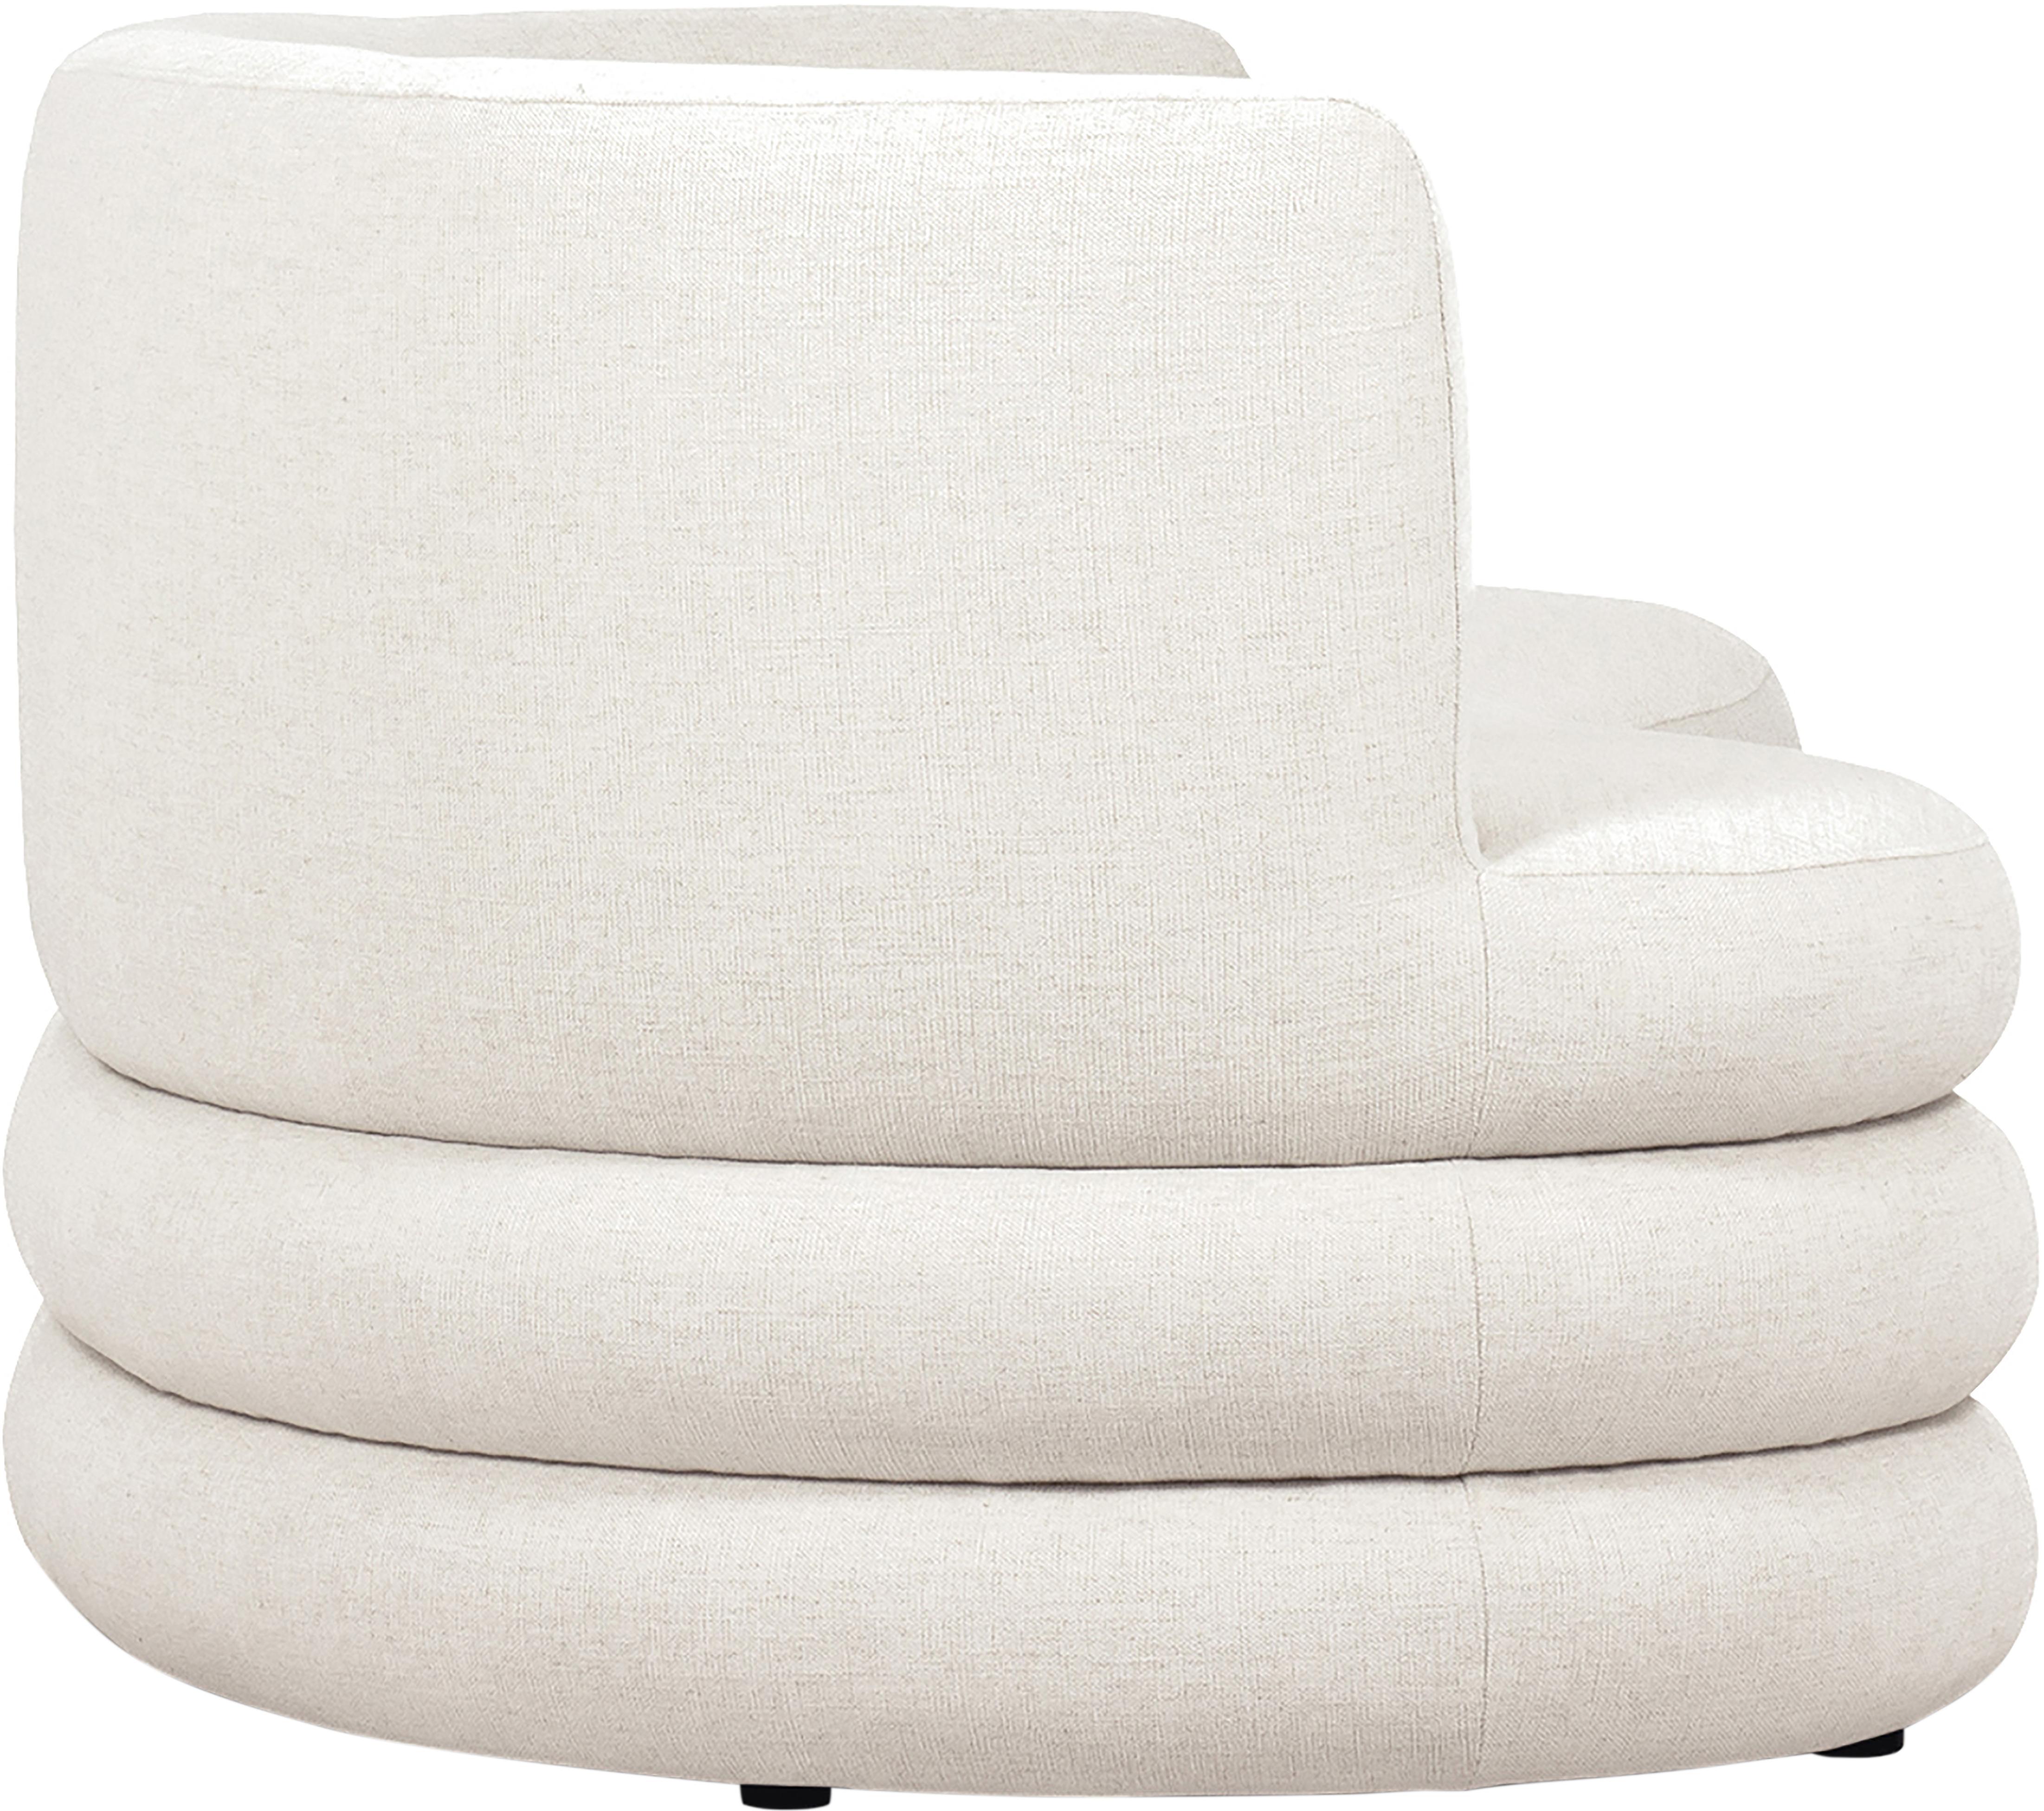 Sofa Solomon (3-Sitzer), Bezug: 56% Viskose, 21% Polyeste, Gestell: Massives Fichtenholz, Bir, Füße: Kunststoff, Webstoff Beige, B 200 x T 95 cm